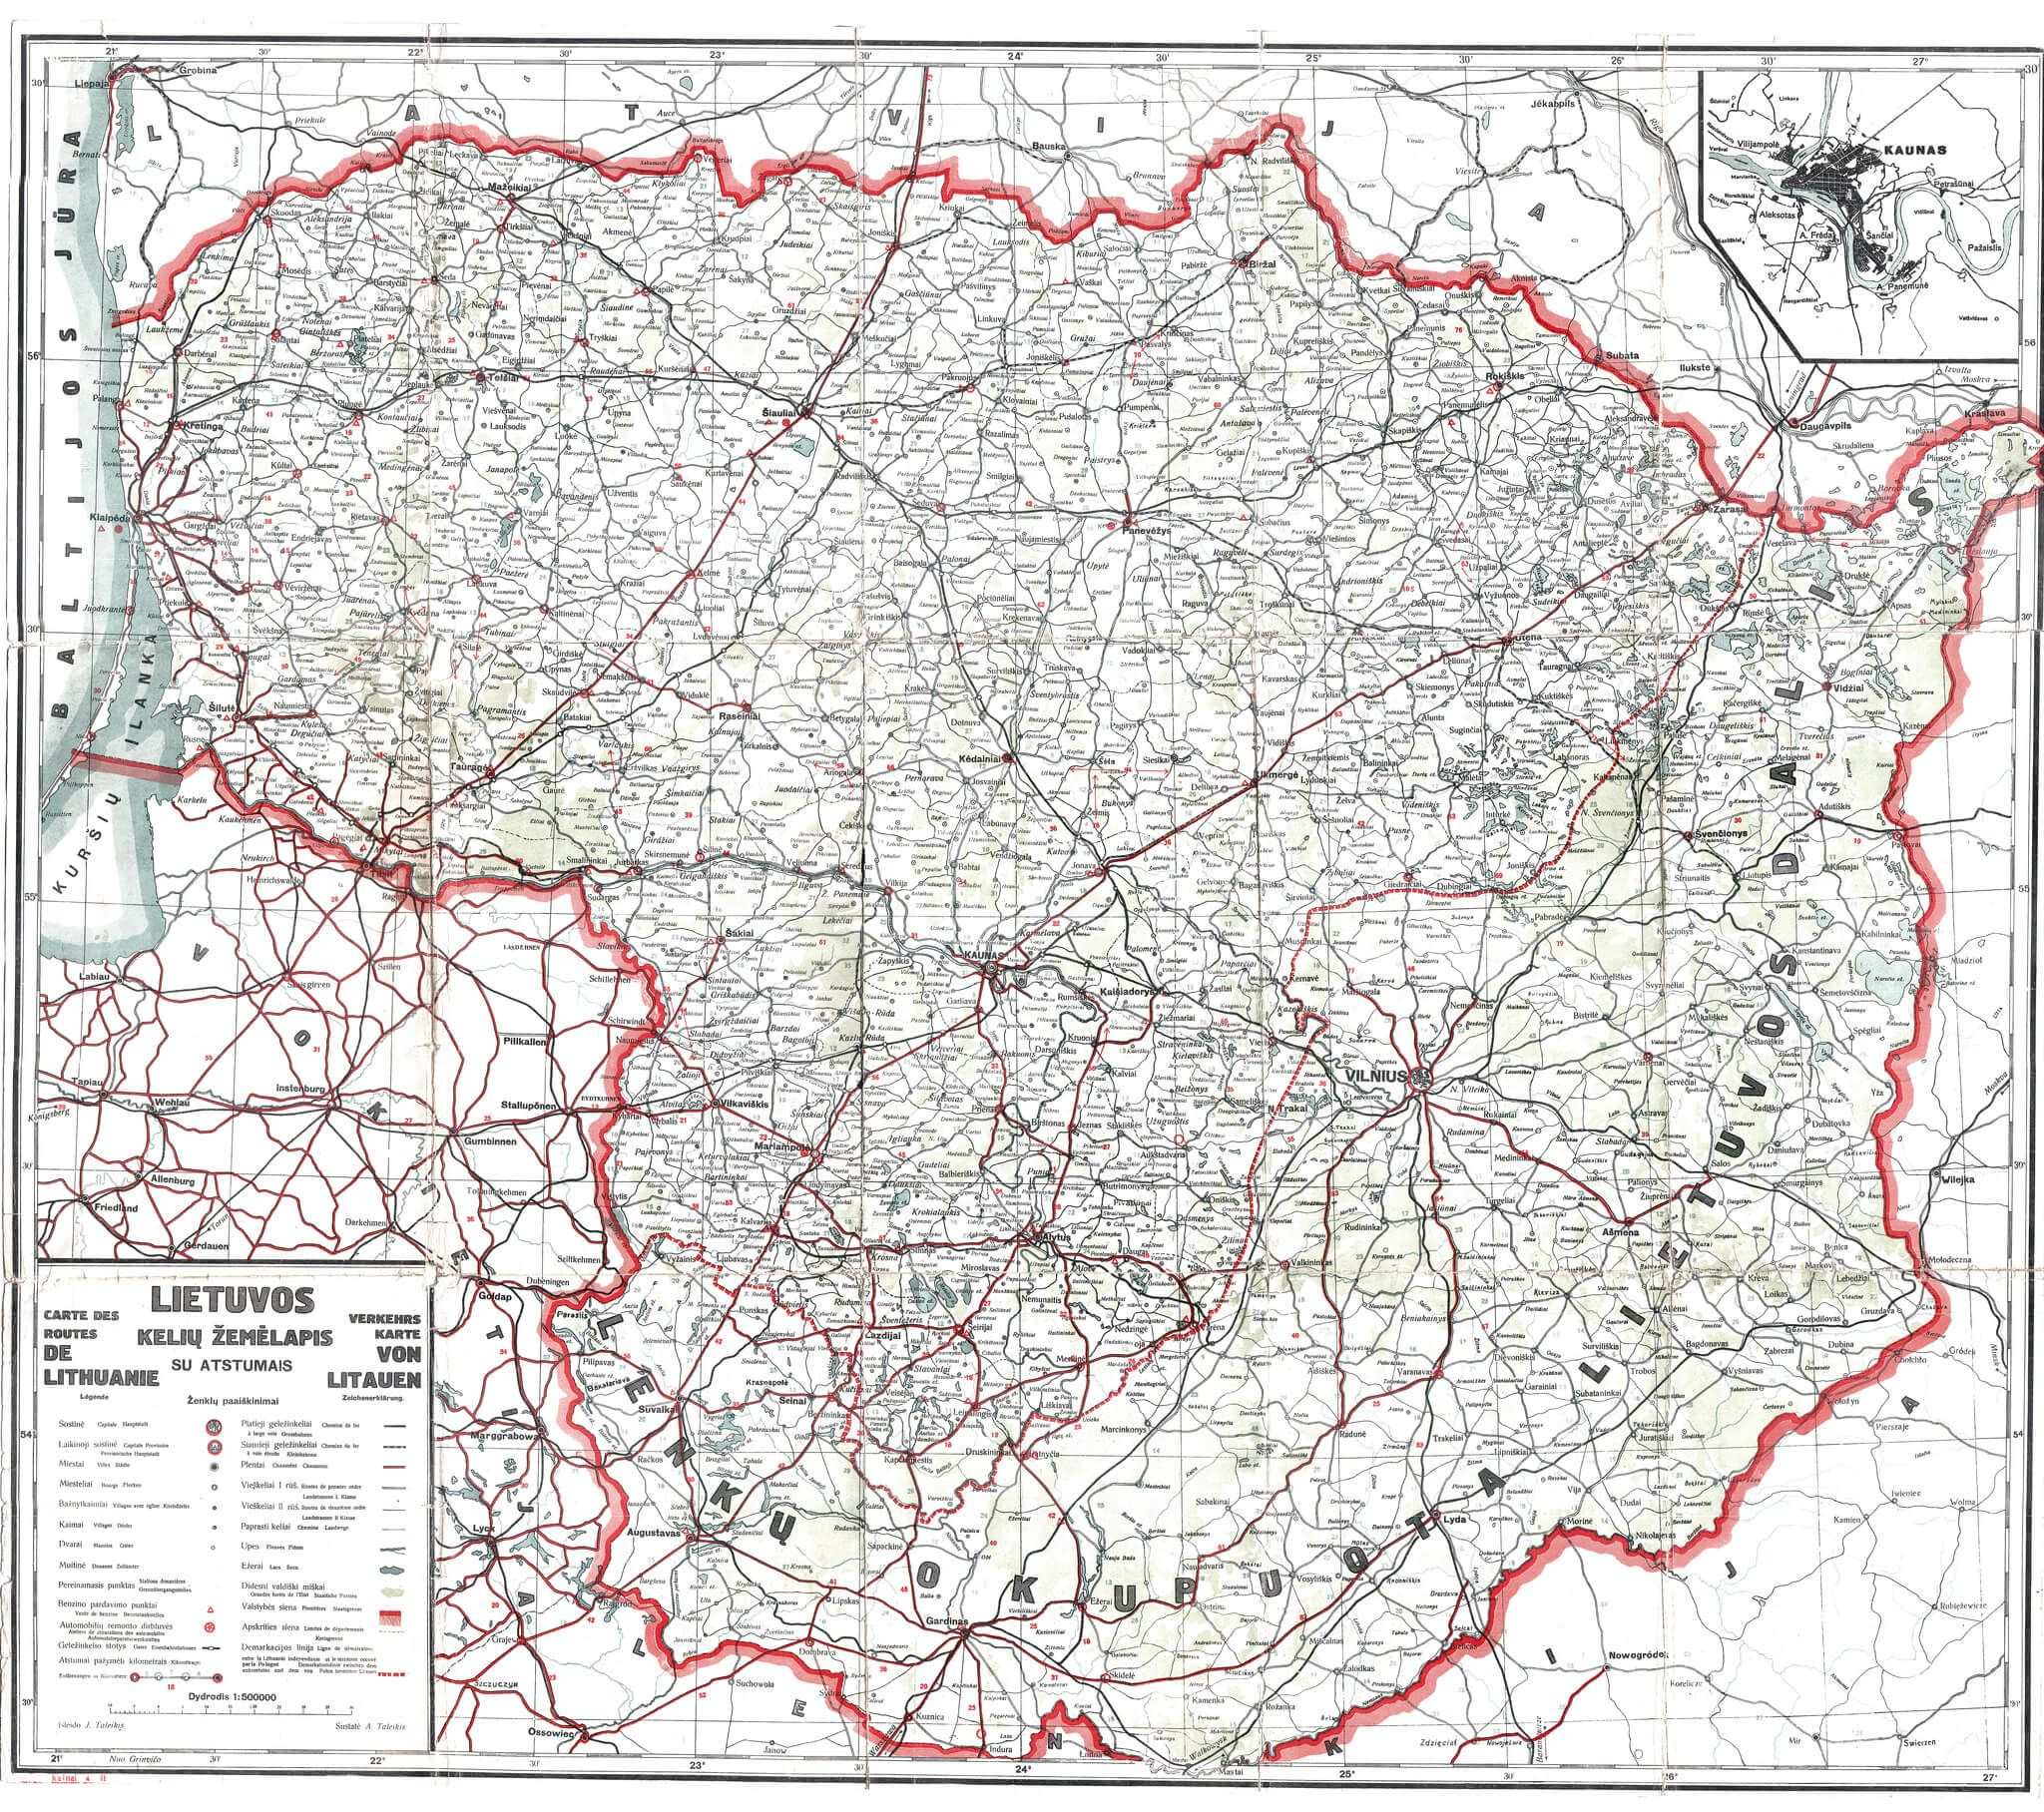 353 5000 Map Of Lithuania With Distances1932 1936 Carte Des Routes De Lithuanie Verkehrs Map Von Litauen Scale 1 500 000 Map Historical Maps Geography Map